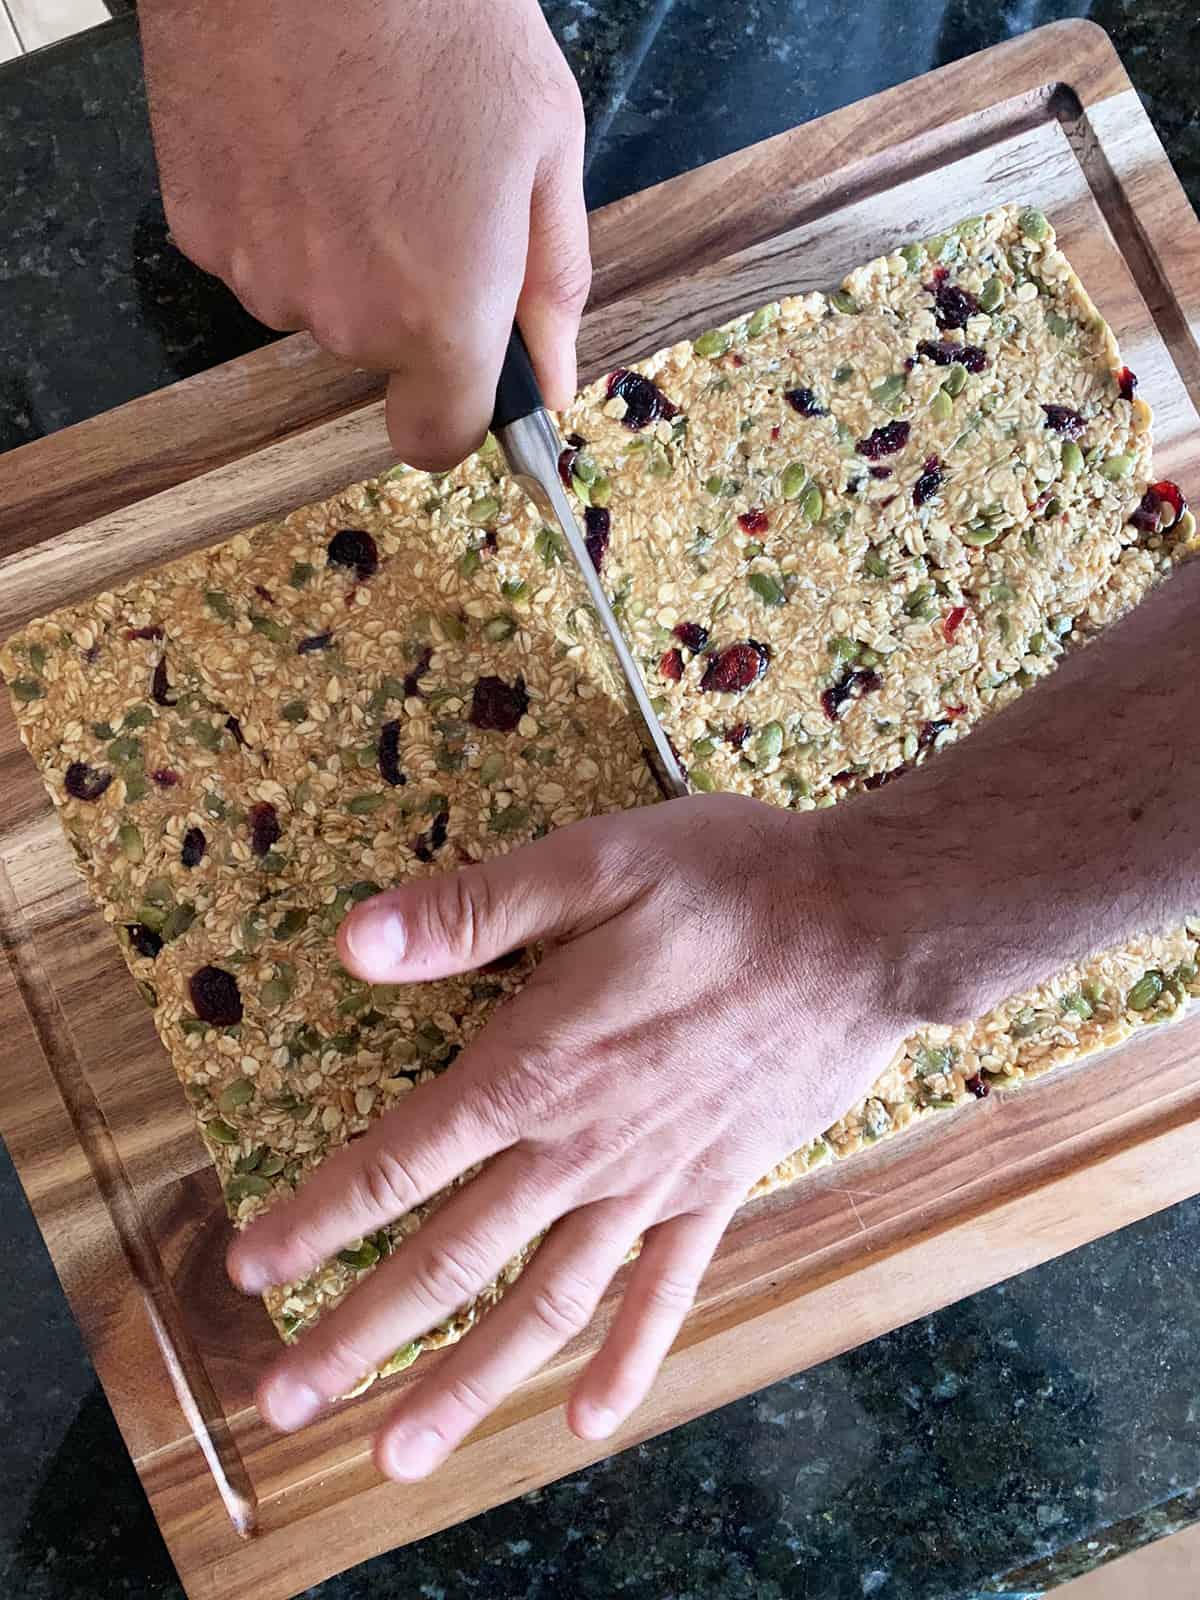 male hand cutting a slab of no bake granola bars